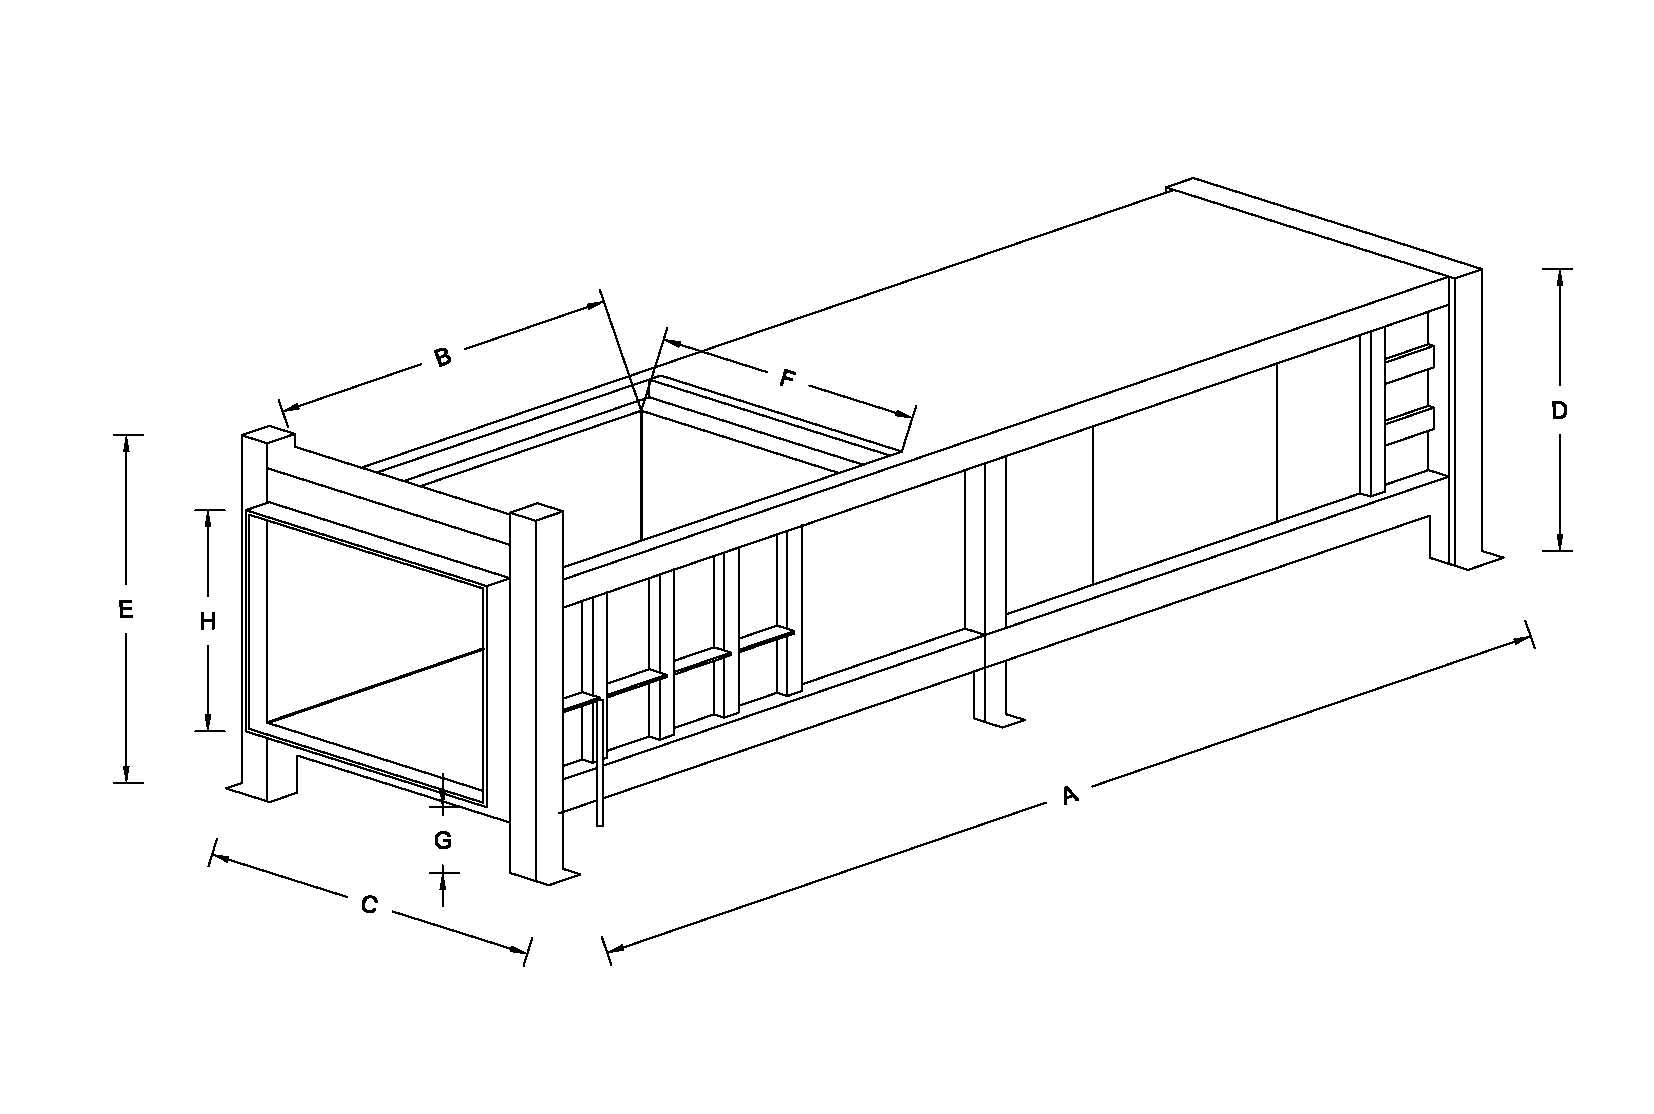 10 Yard Stationary Compactors